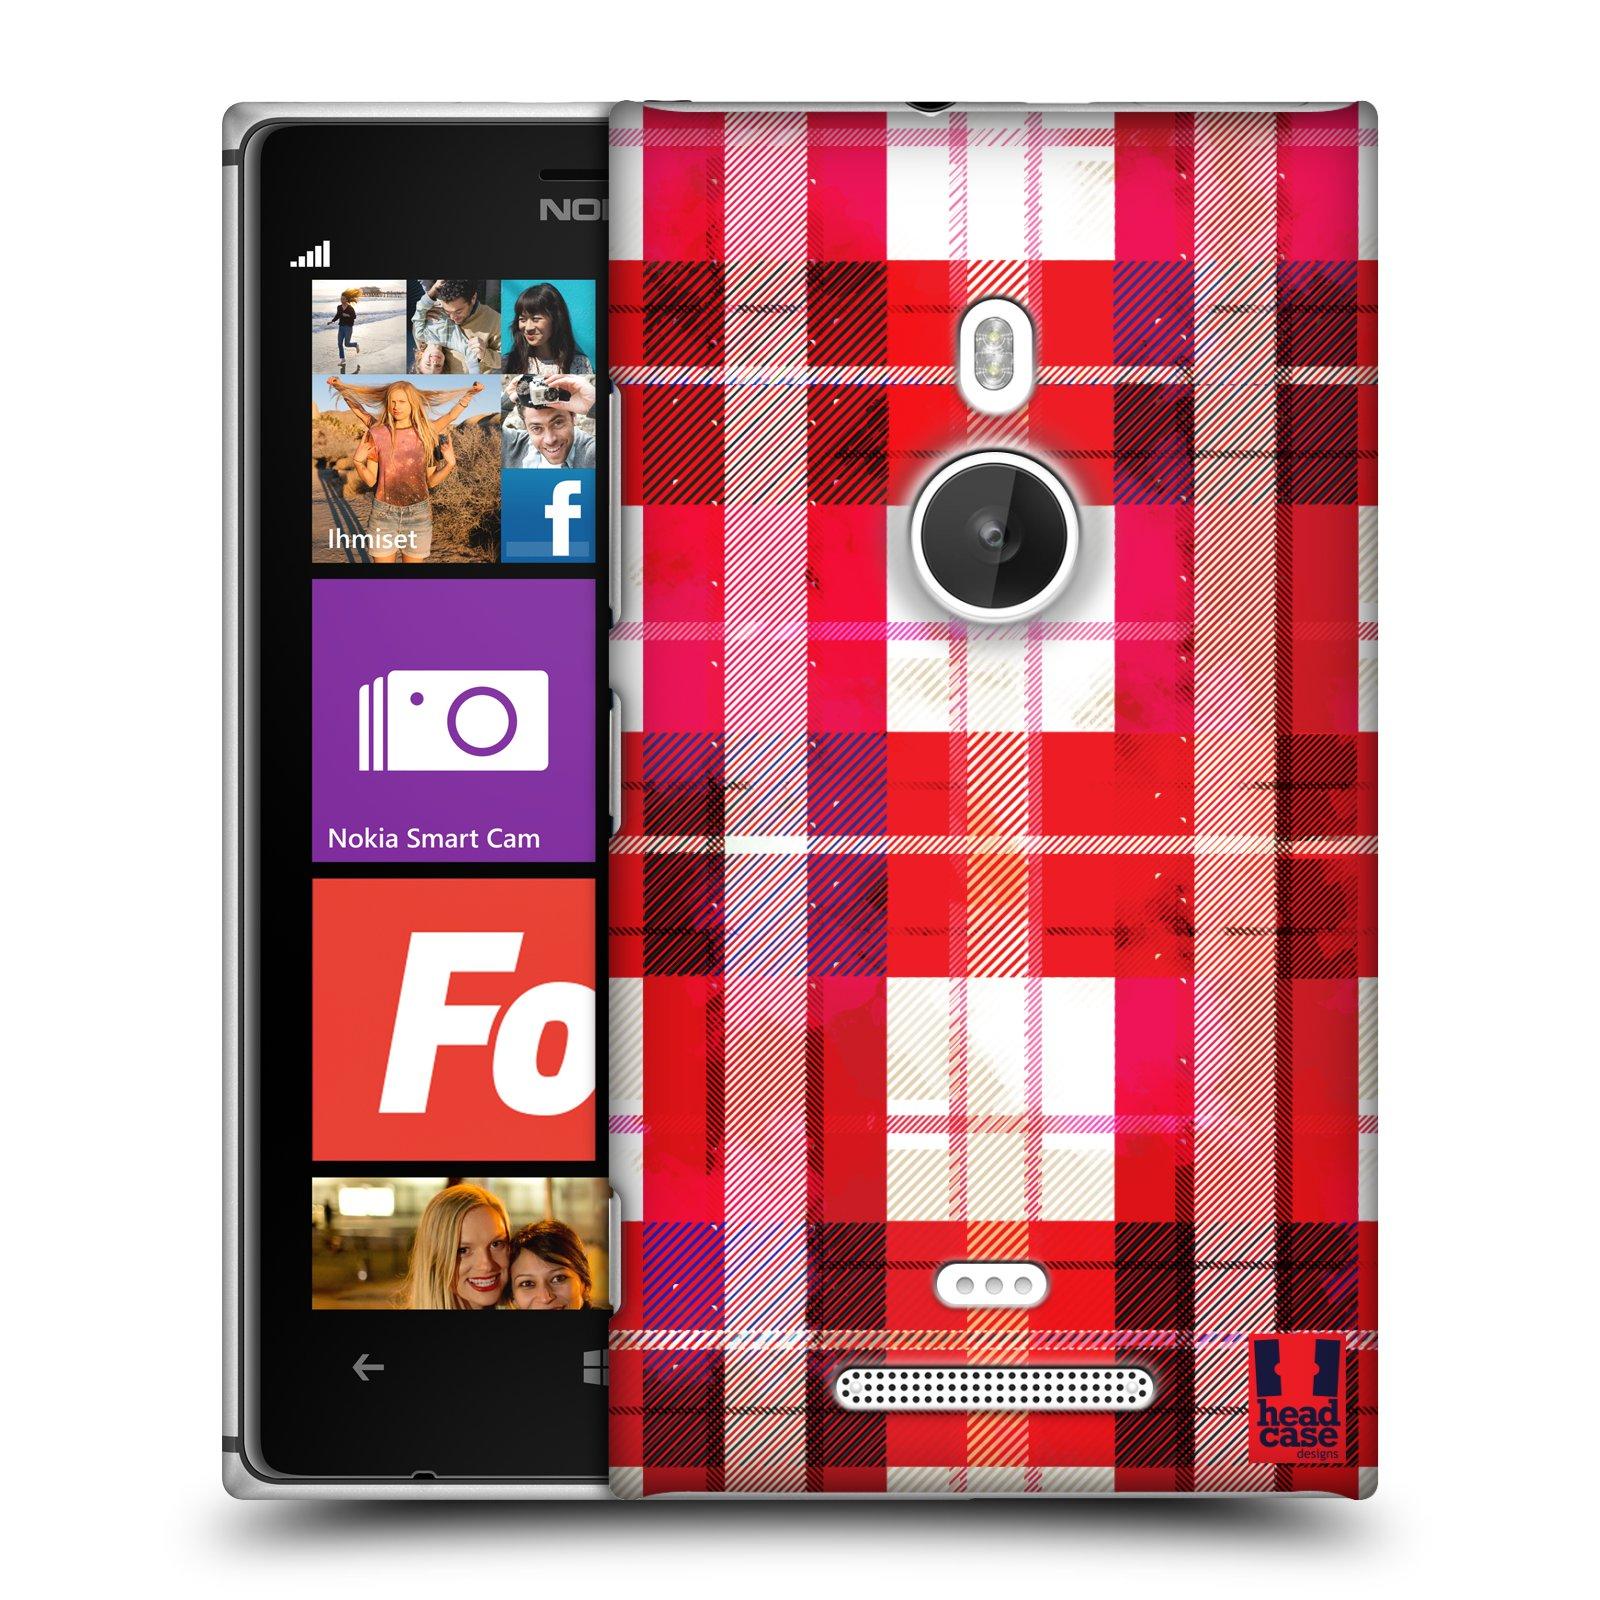 Plastové pouzdro na mobil Nokia Lumia 925 HEAD CASE FLANEL RED (Kryt či obal na mobilní telefon Nokia Lumia 925)